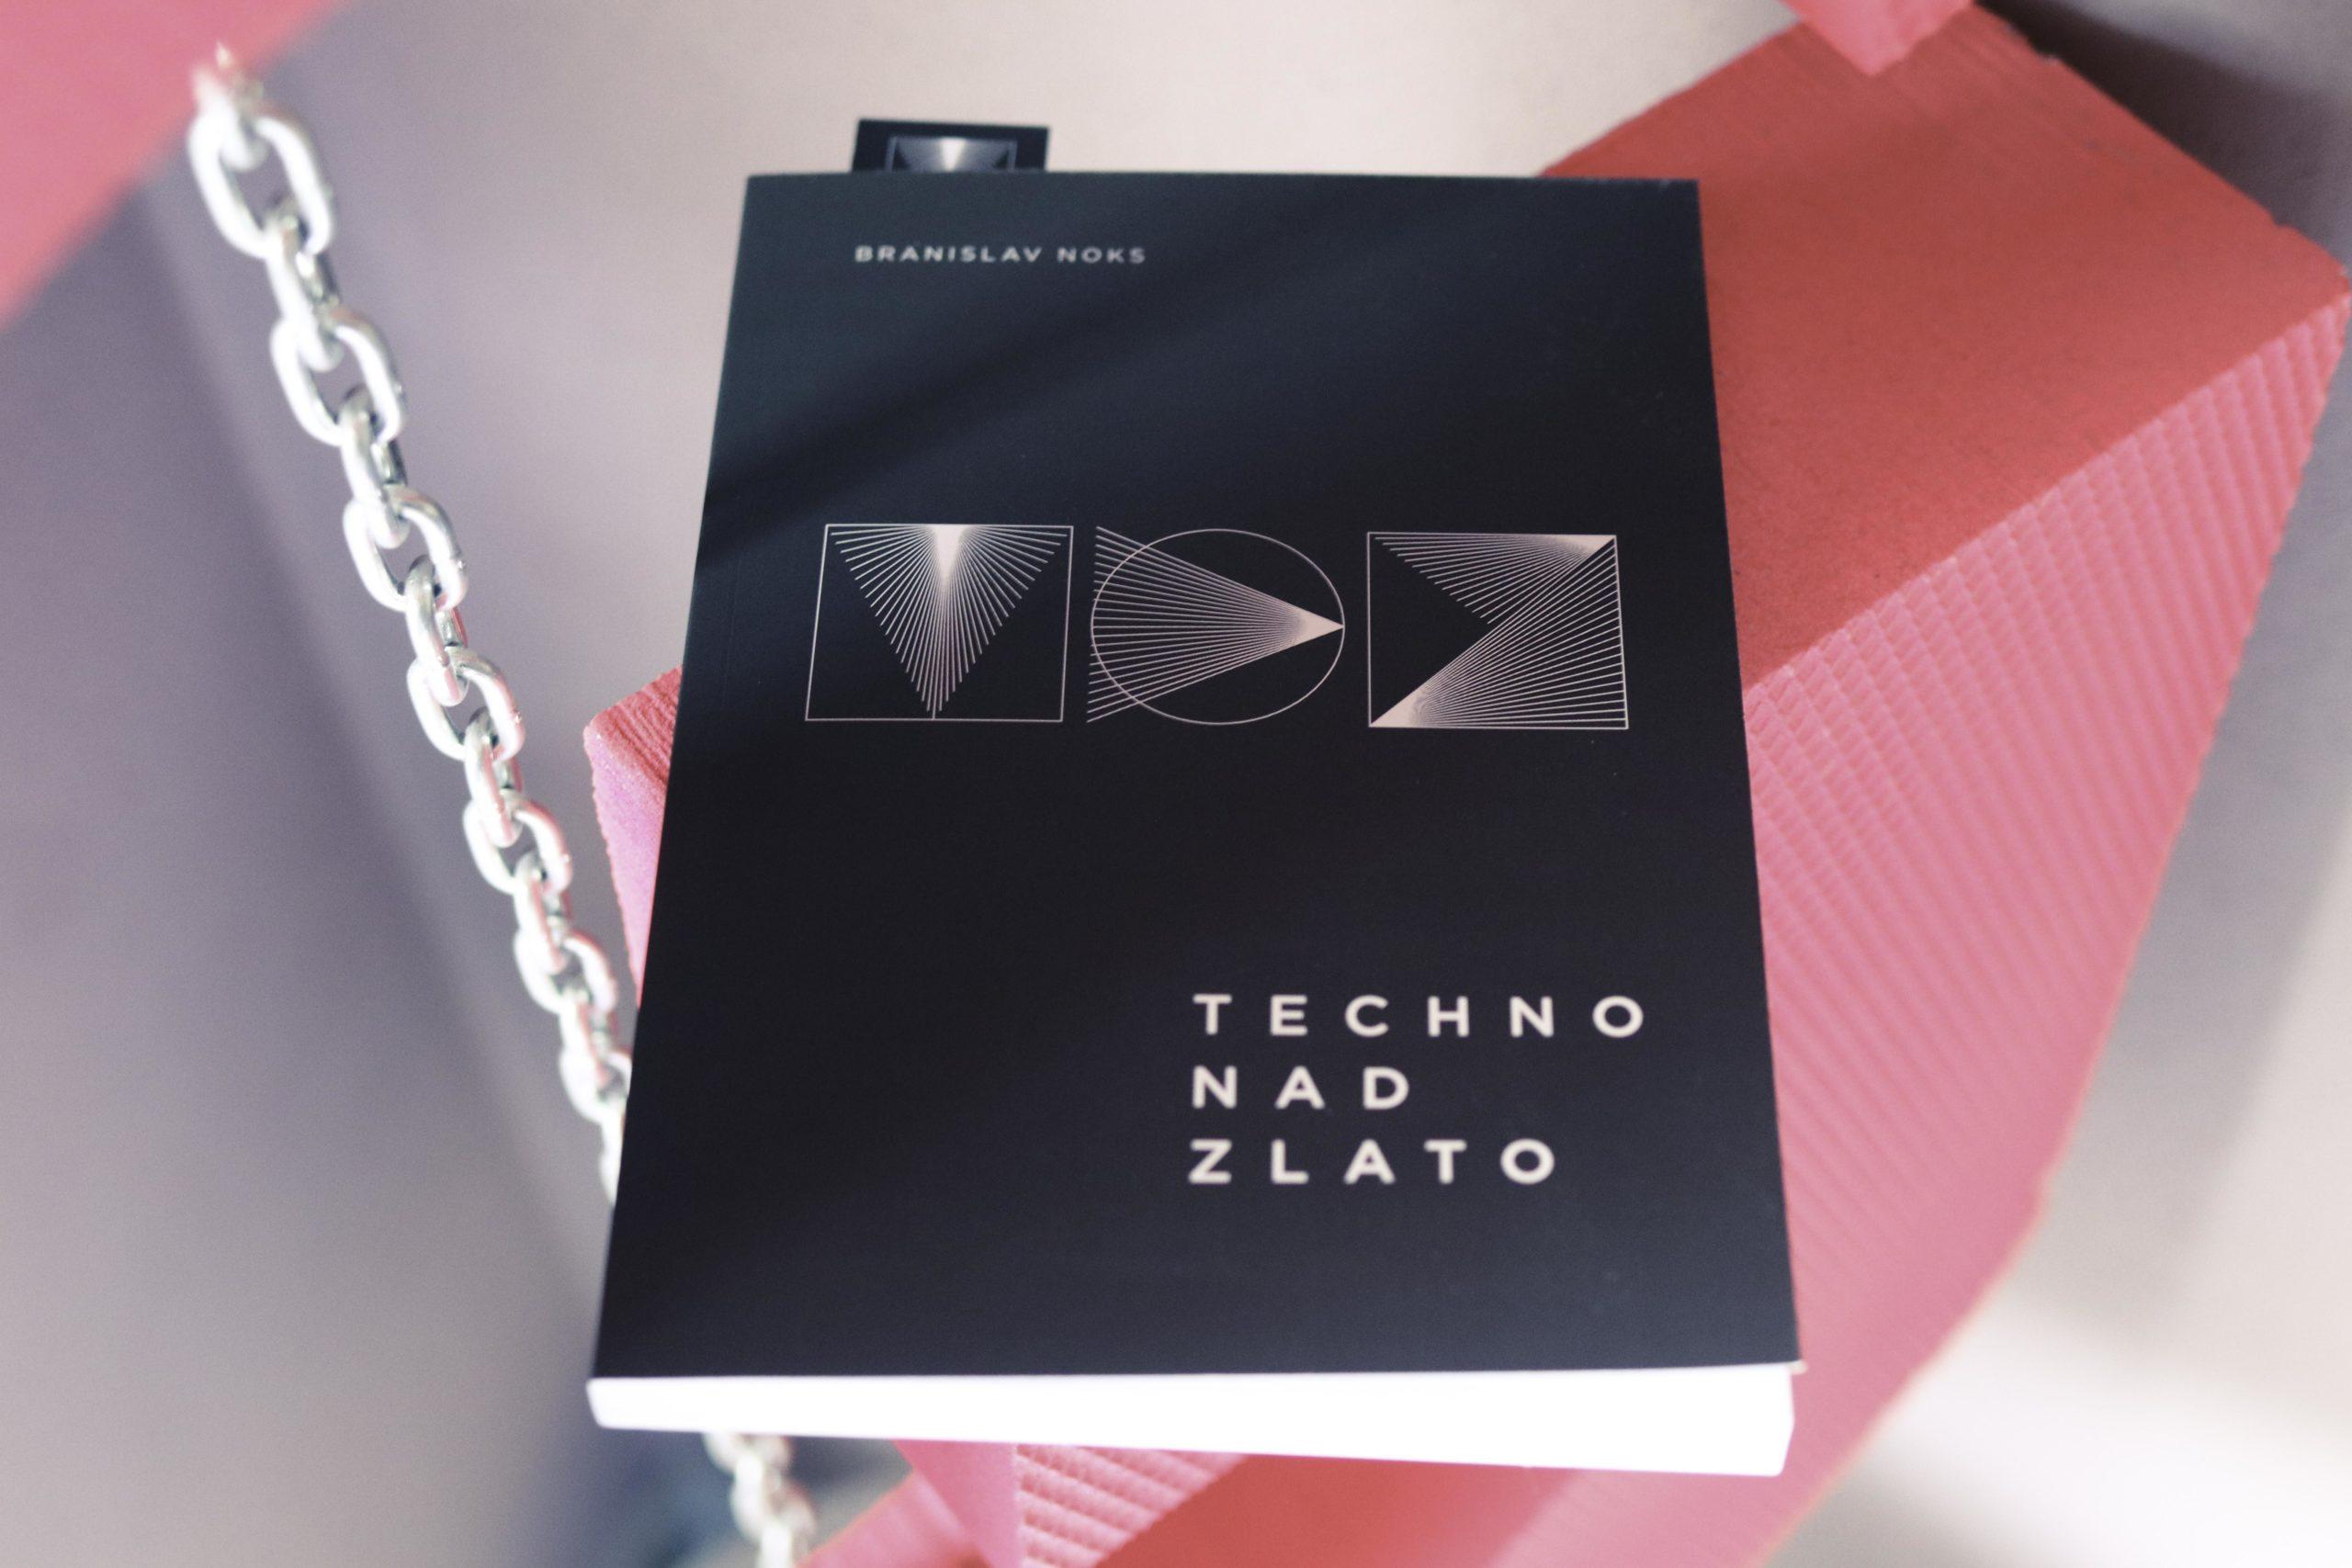 kniha Techno nad Zlato